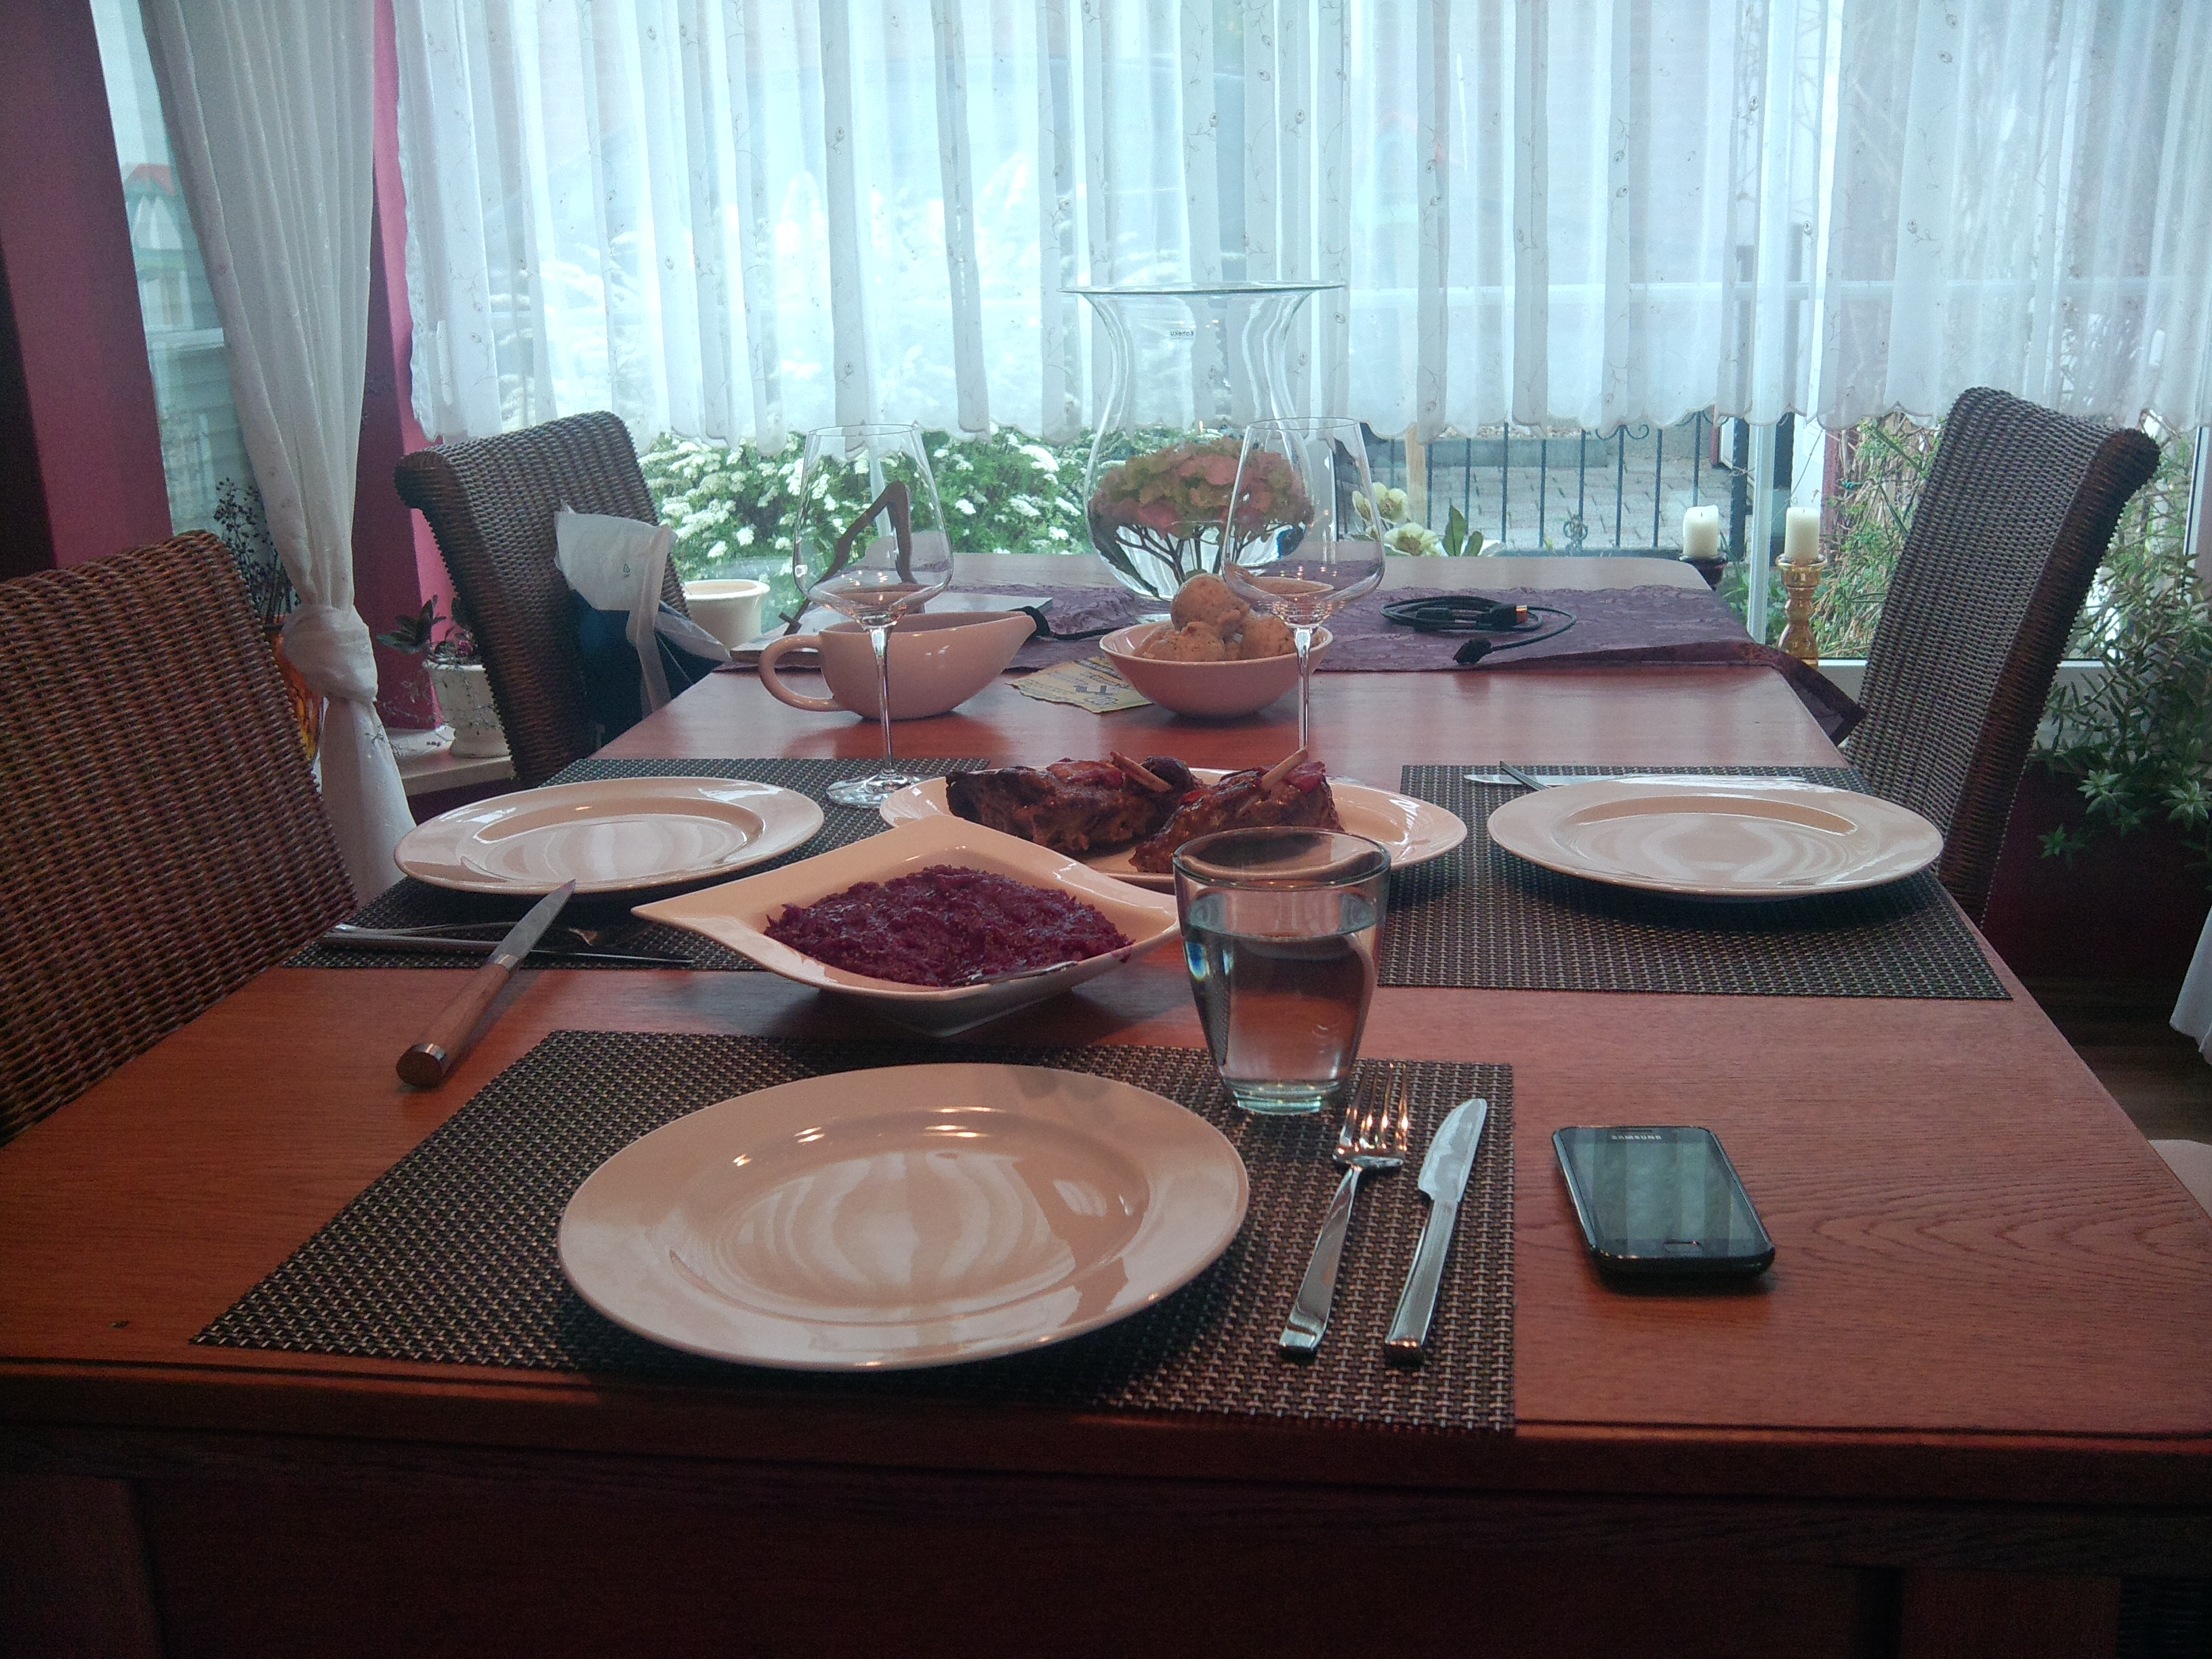 https://foodloader.net/Timber_2012-04-22_Argentinische_Hasenpfanne.jpg